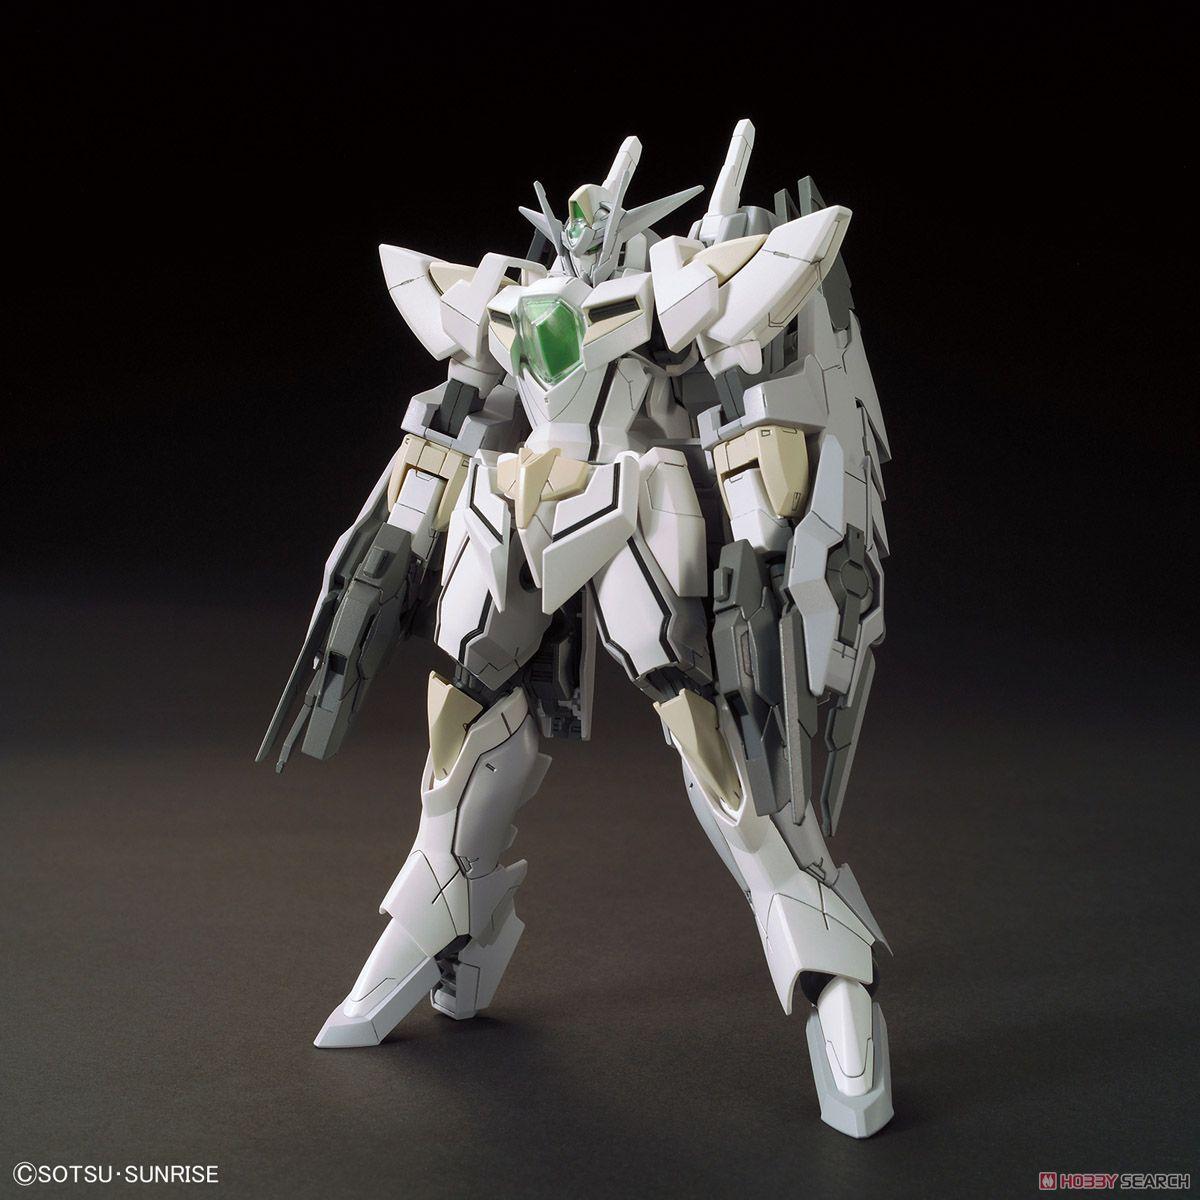 Reversible Gundam (HGBF) (Gundam Model Kits) Item picture1